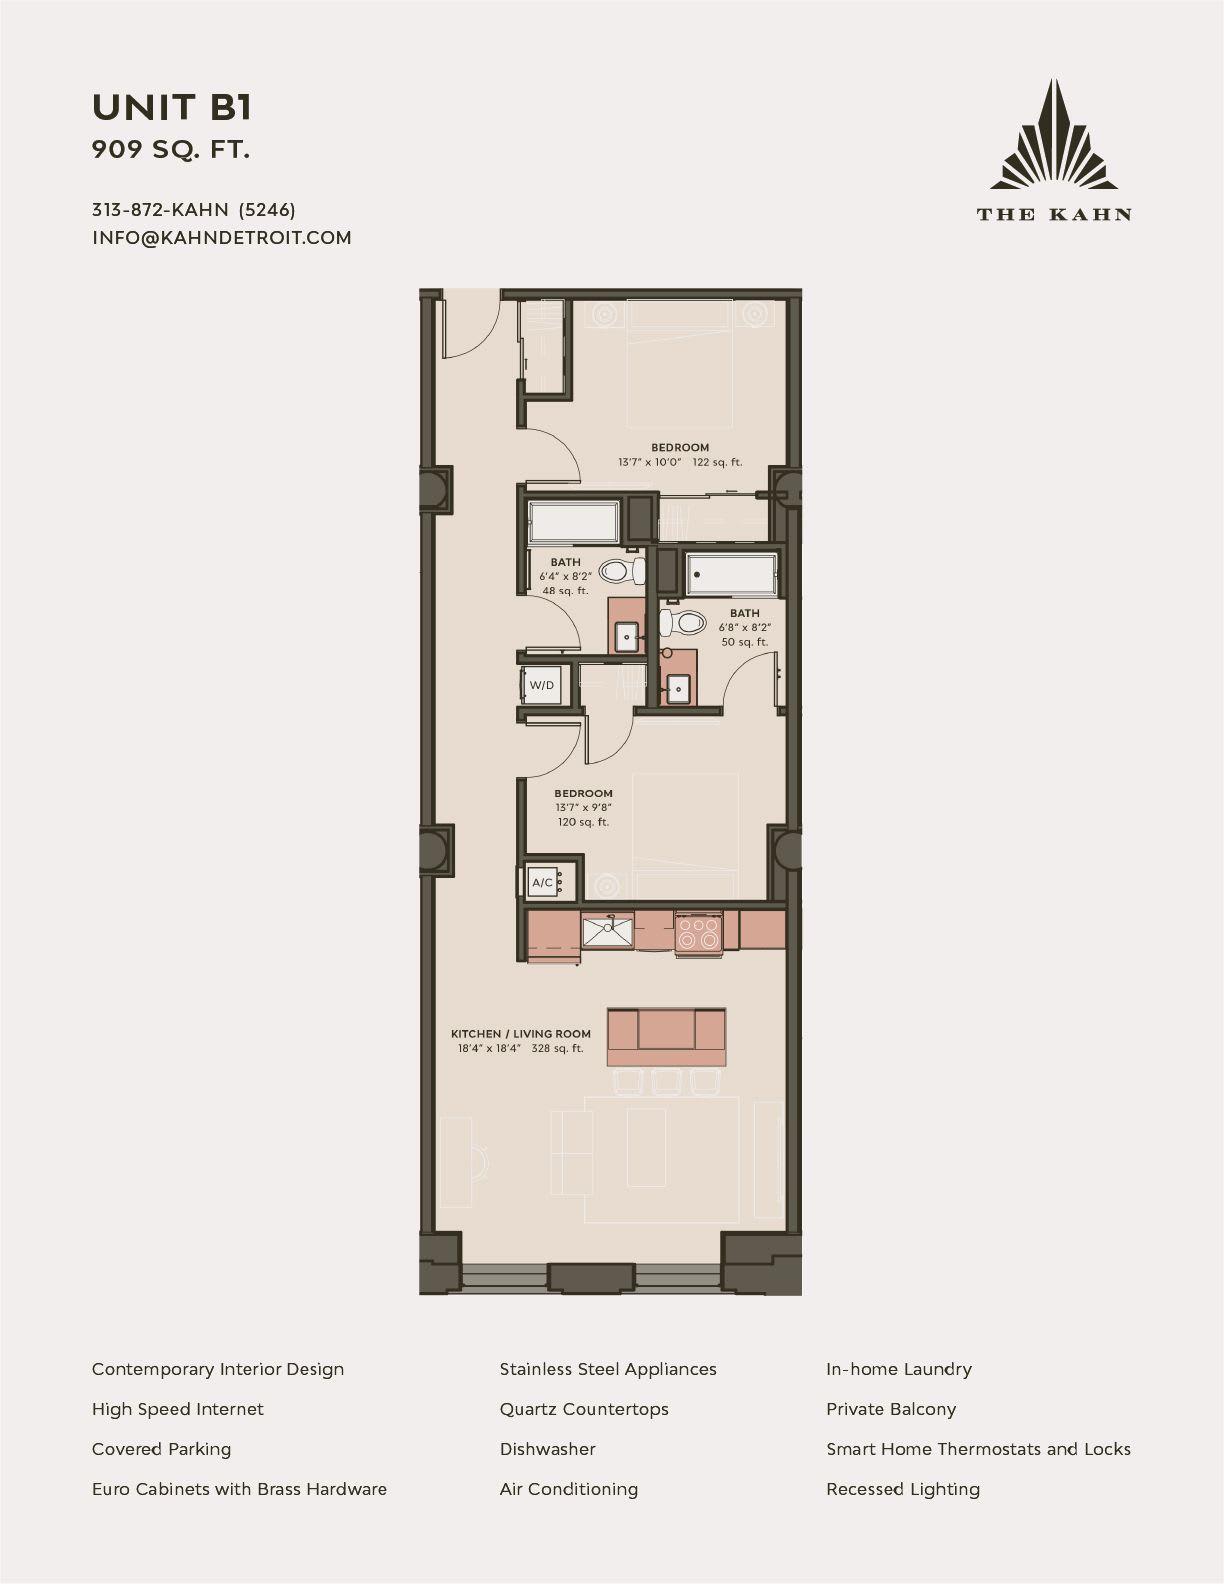 B1 floor plan image at The Kahn in Detroit, Michigan